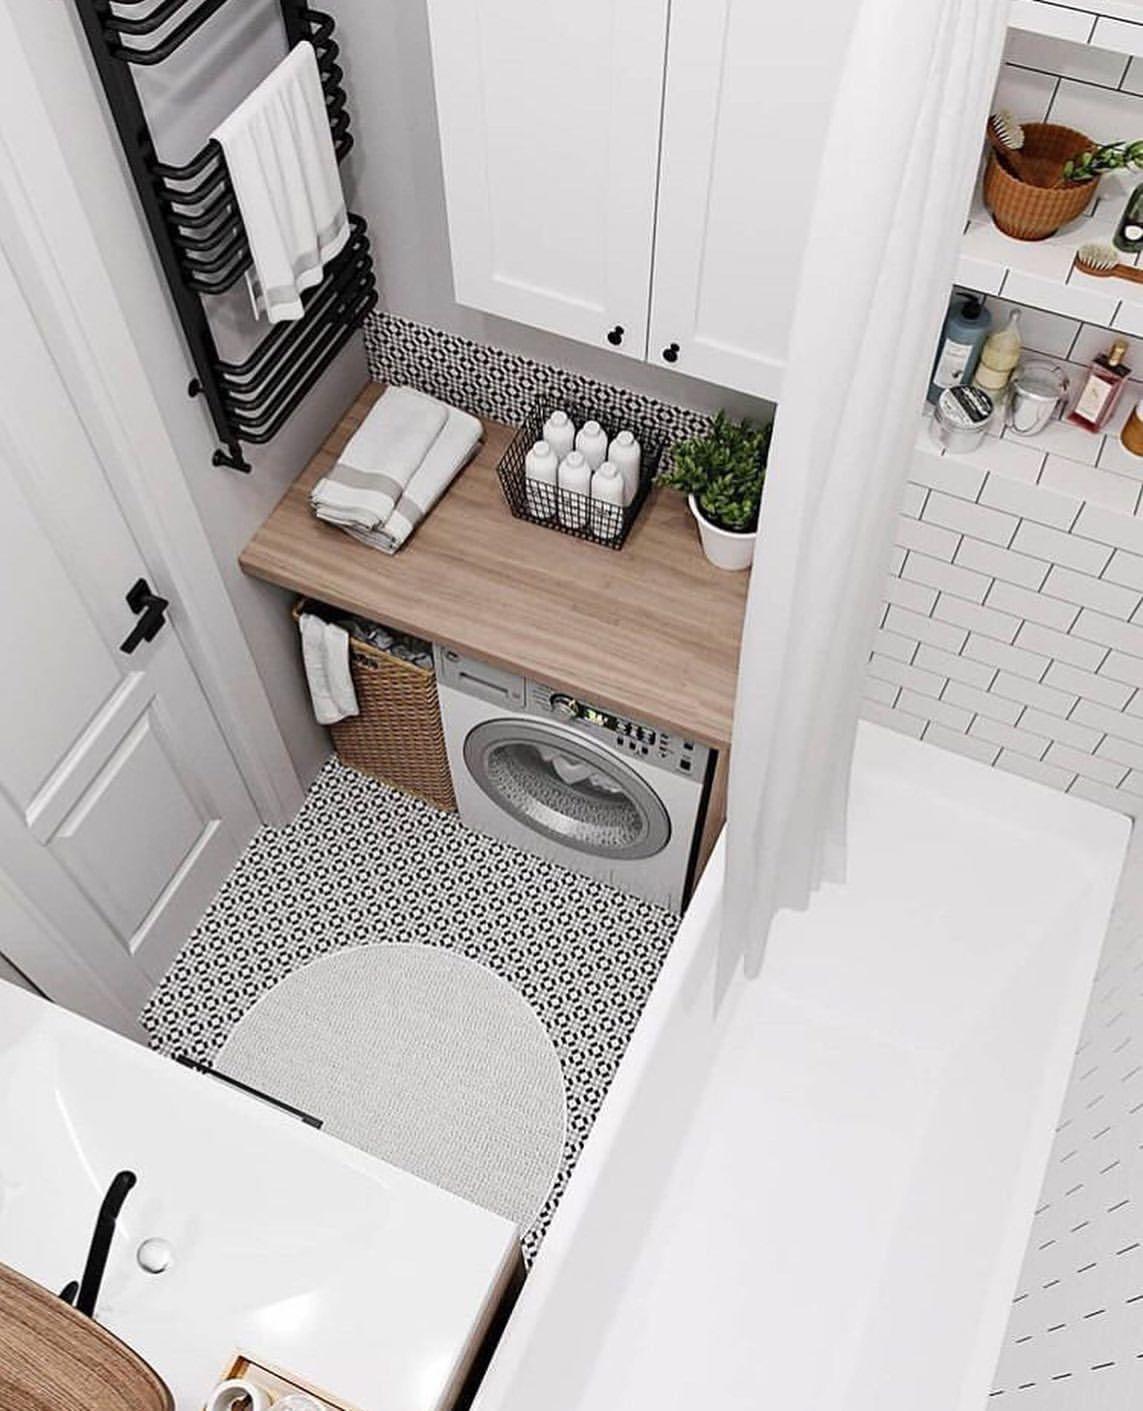 Gain De Place Petite Salle De Bain Sur Pinterest Pinterest Bain Petite In 2020 Stylish Laundry Room Small Bathroom Ideas On A Budget Small Bathroom